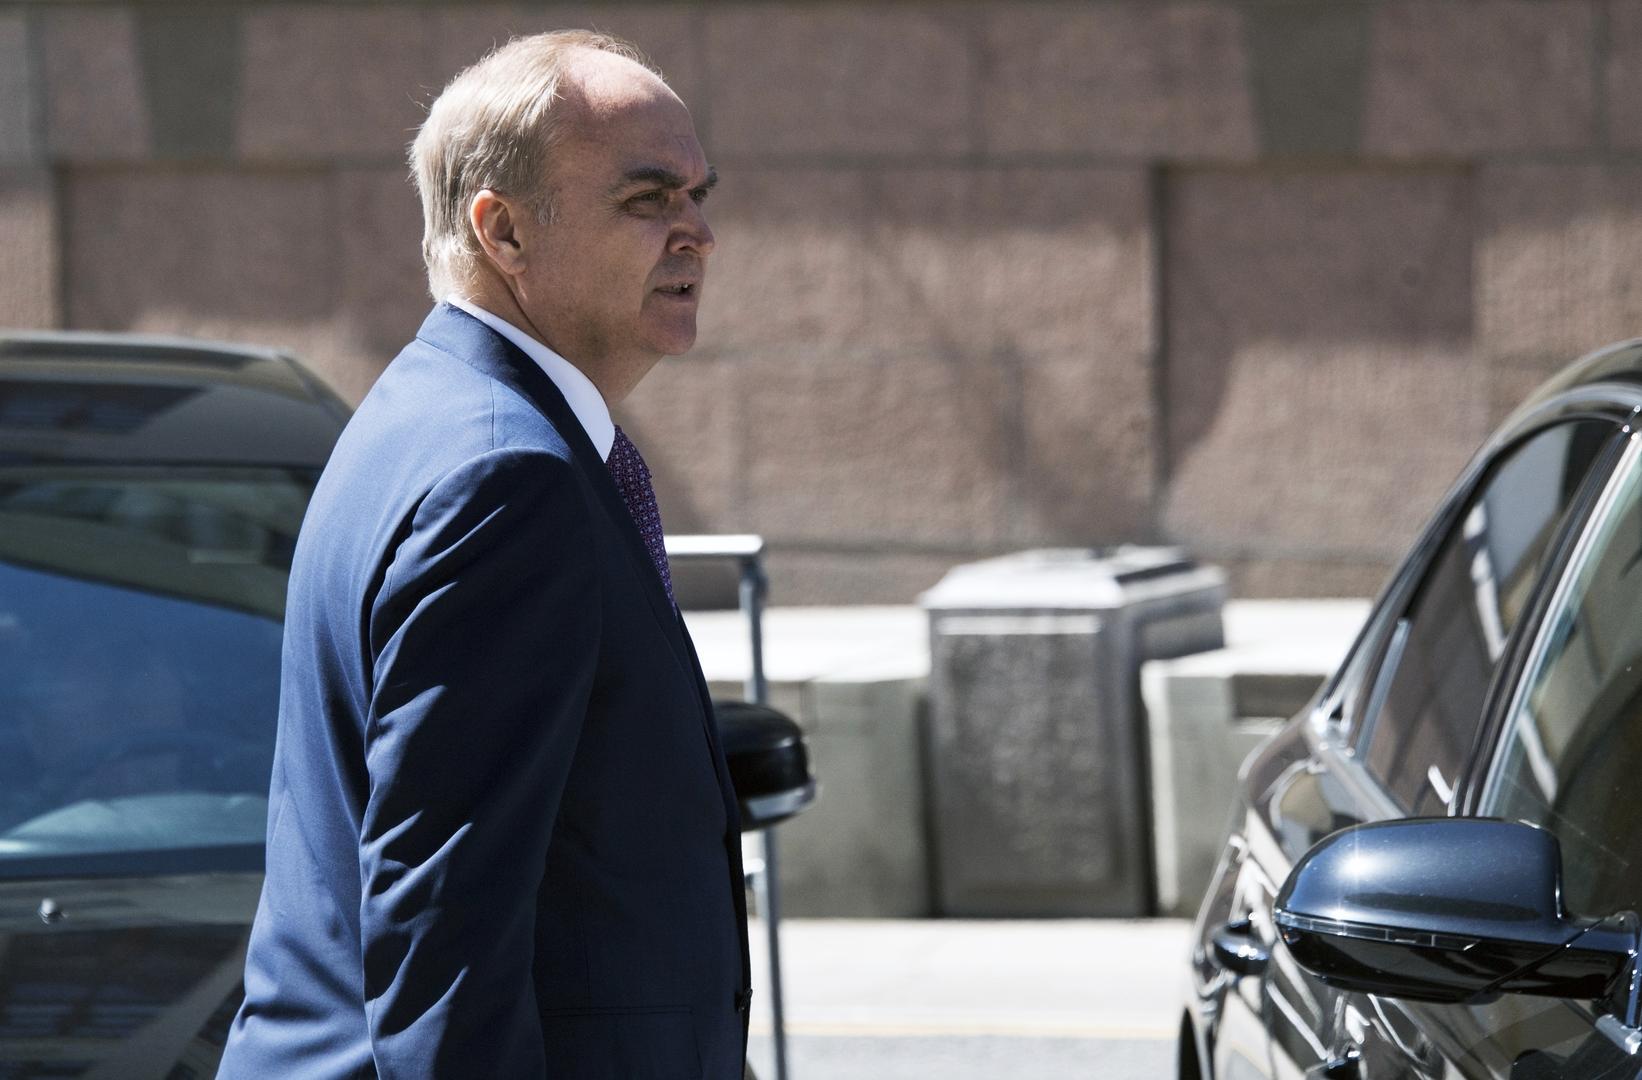 سفير روسيا يغادر موسكو عائدا إلى واشنطن